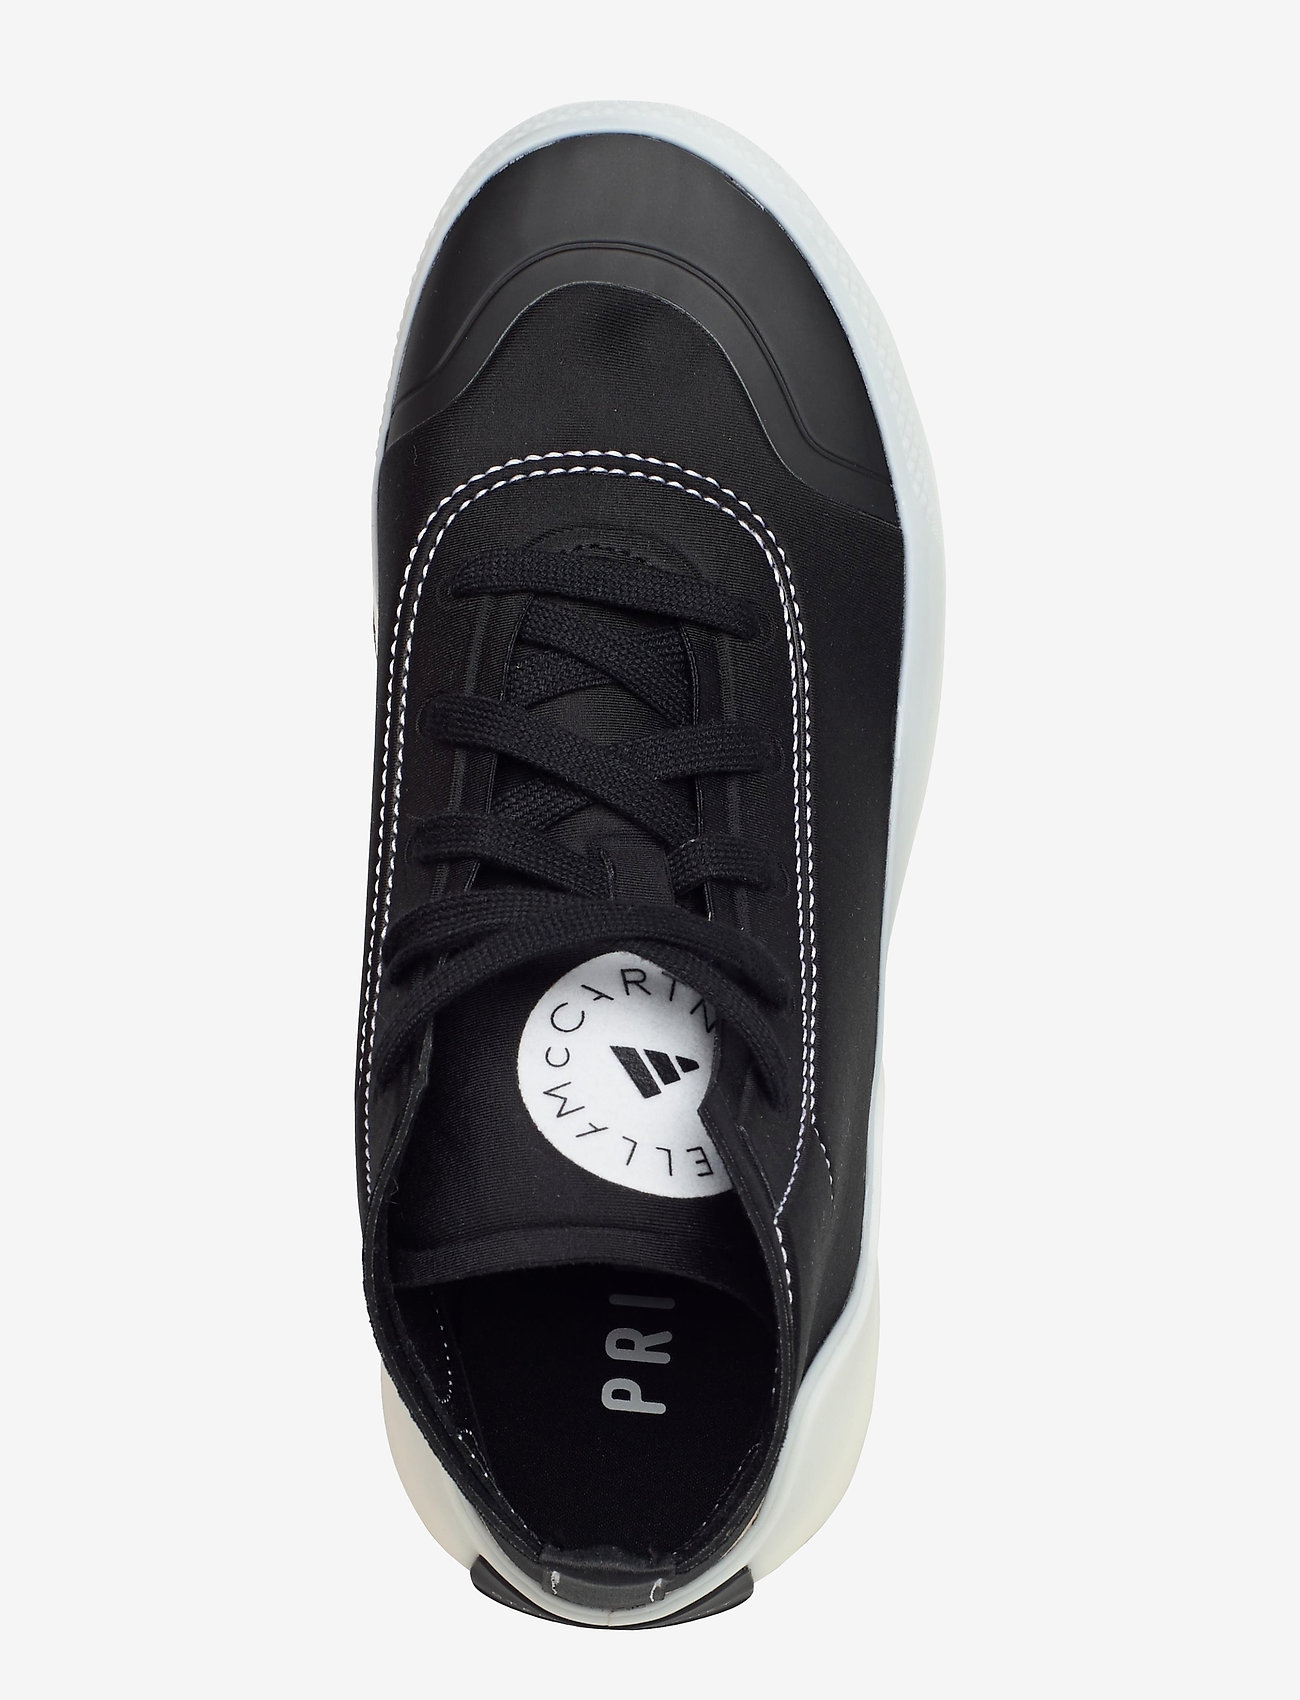 adidas by Stella McCartney - aSMC Treino Mid - high top sneakers - cblack/clowhi/owhite - 3